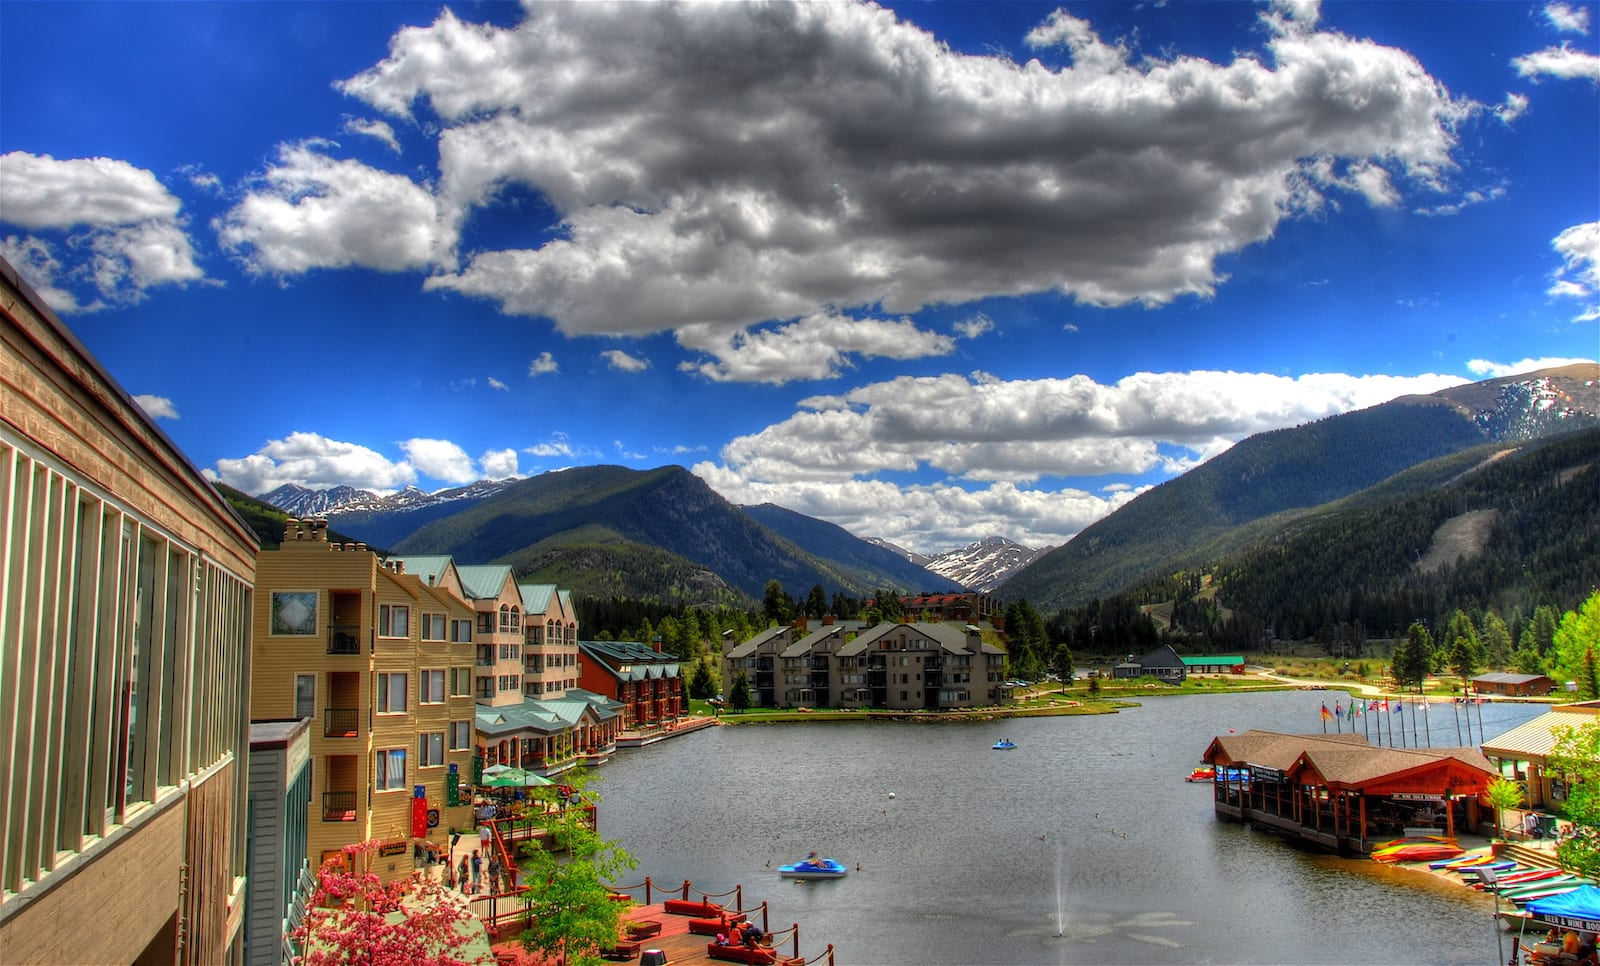 Keystone Lake, Colorado